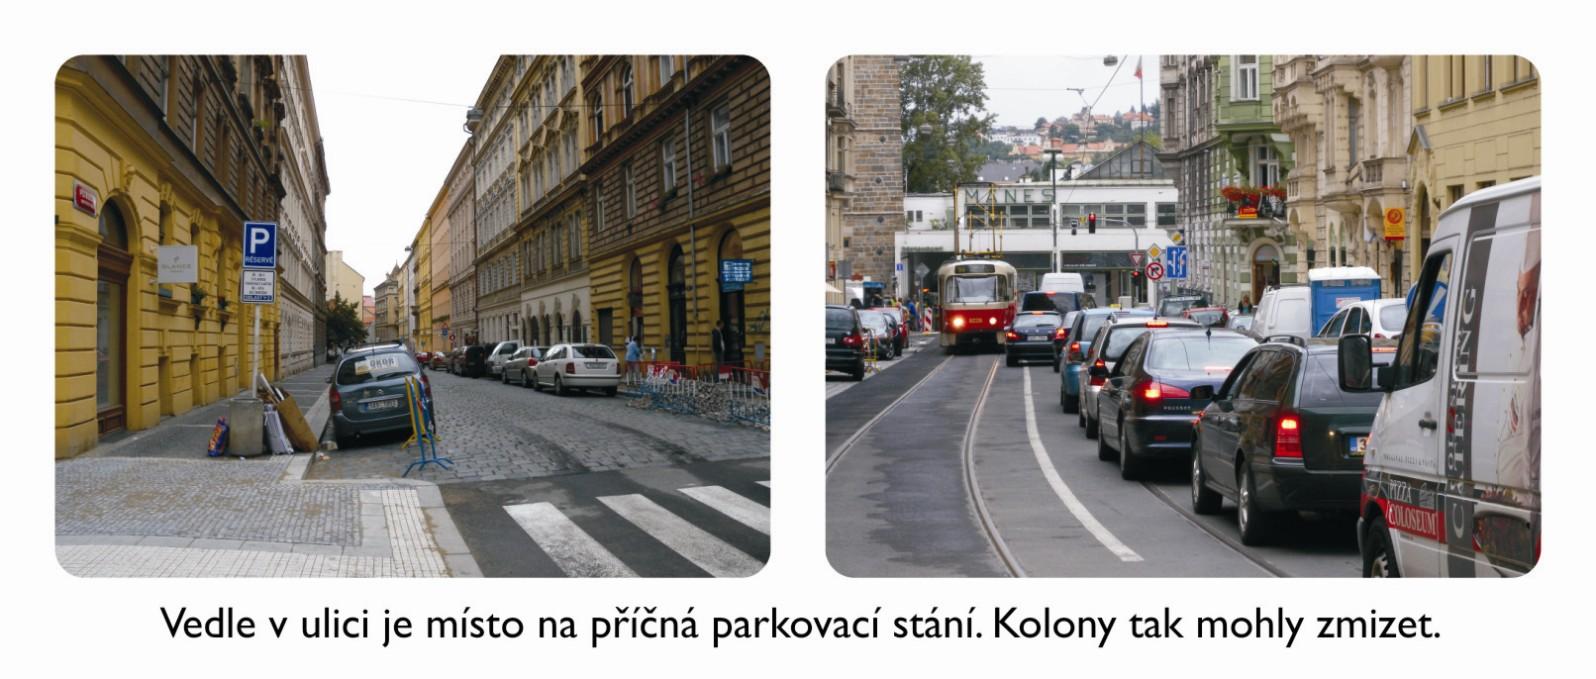 Myslikova4.jpg